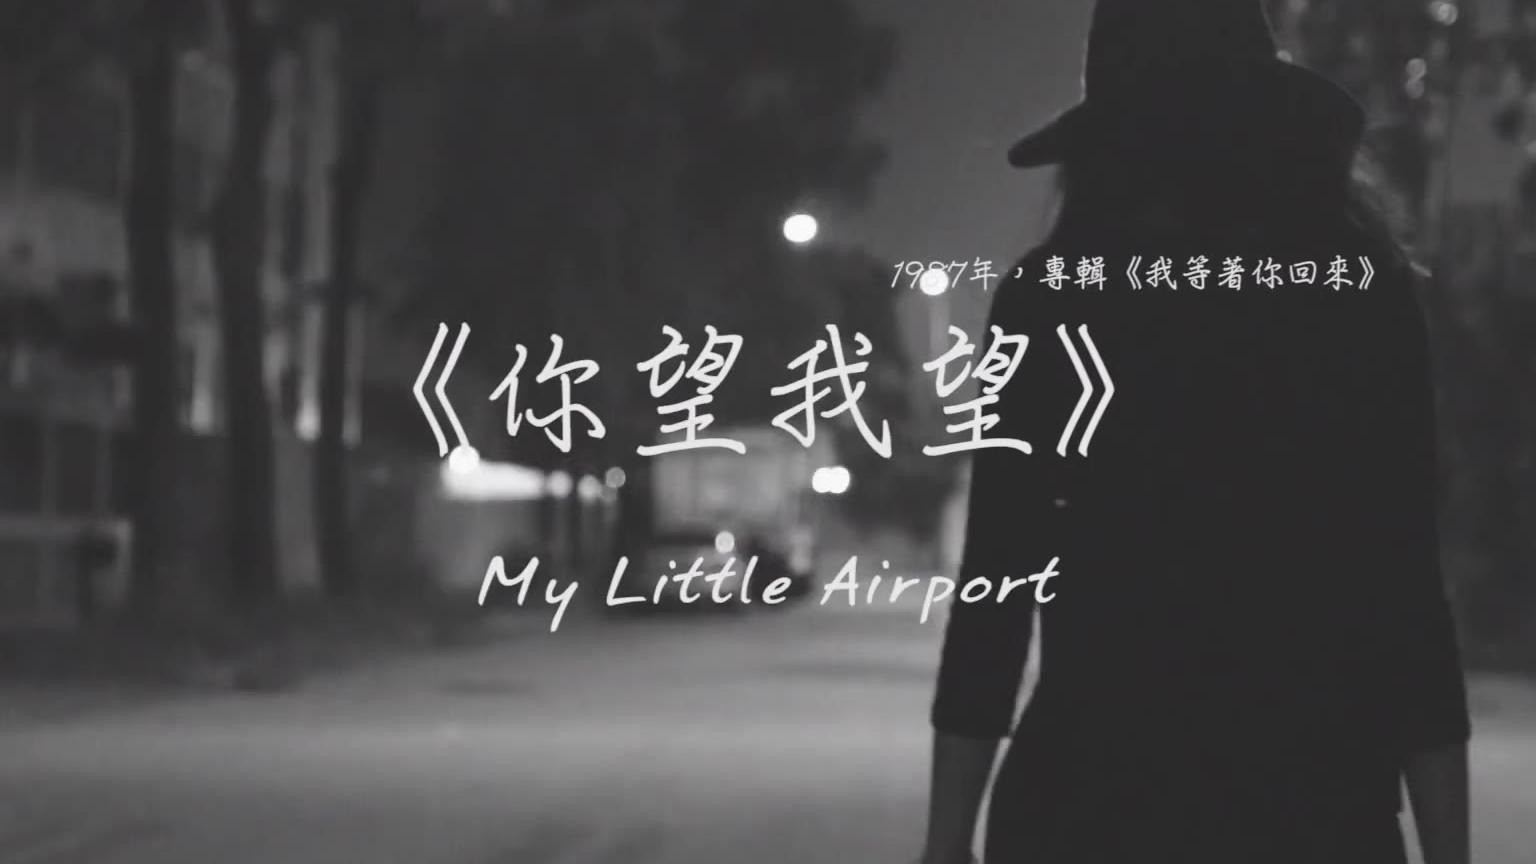 my little airport - 你望我望